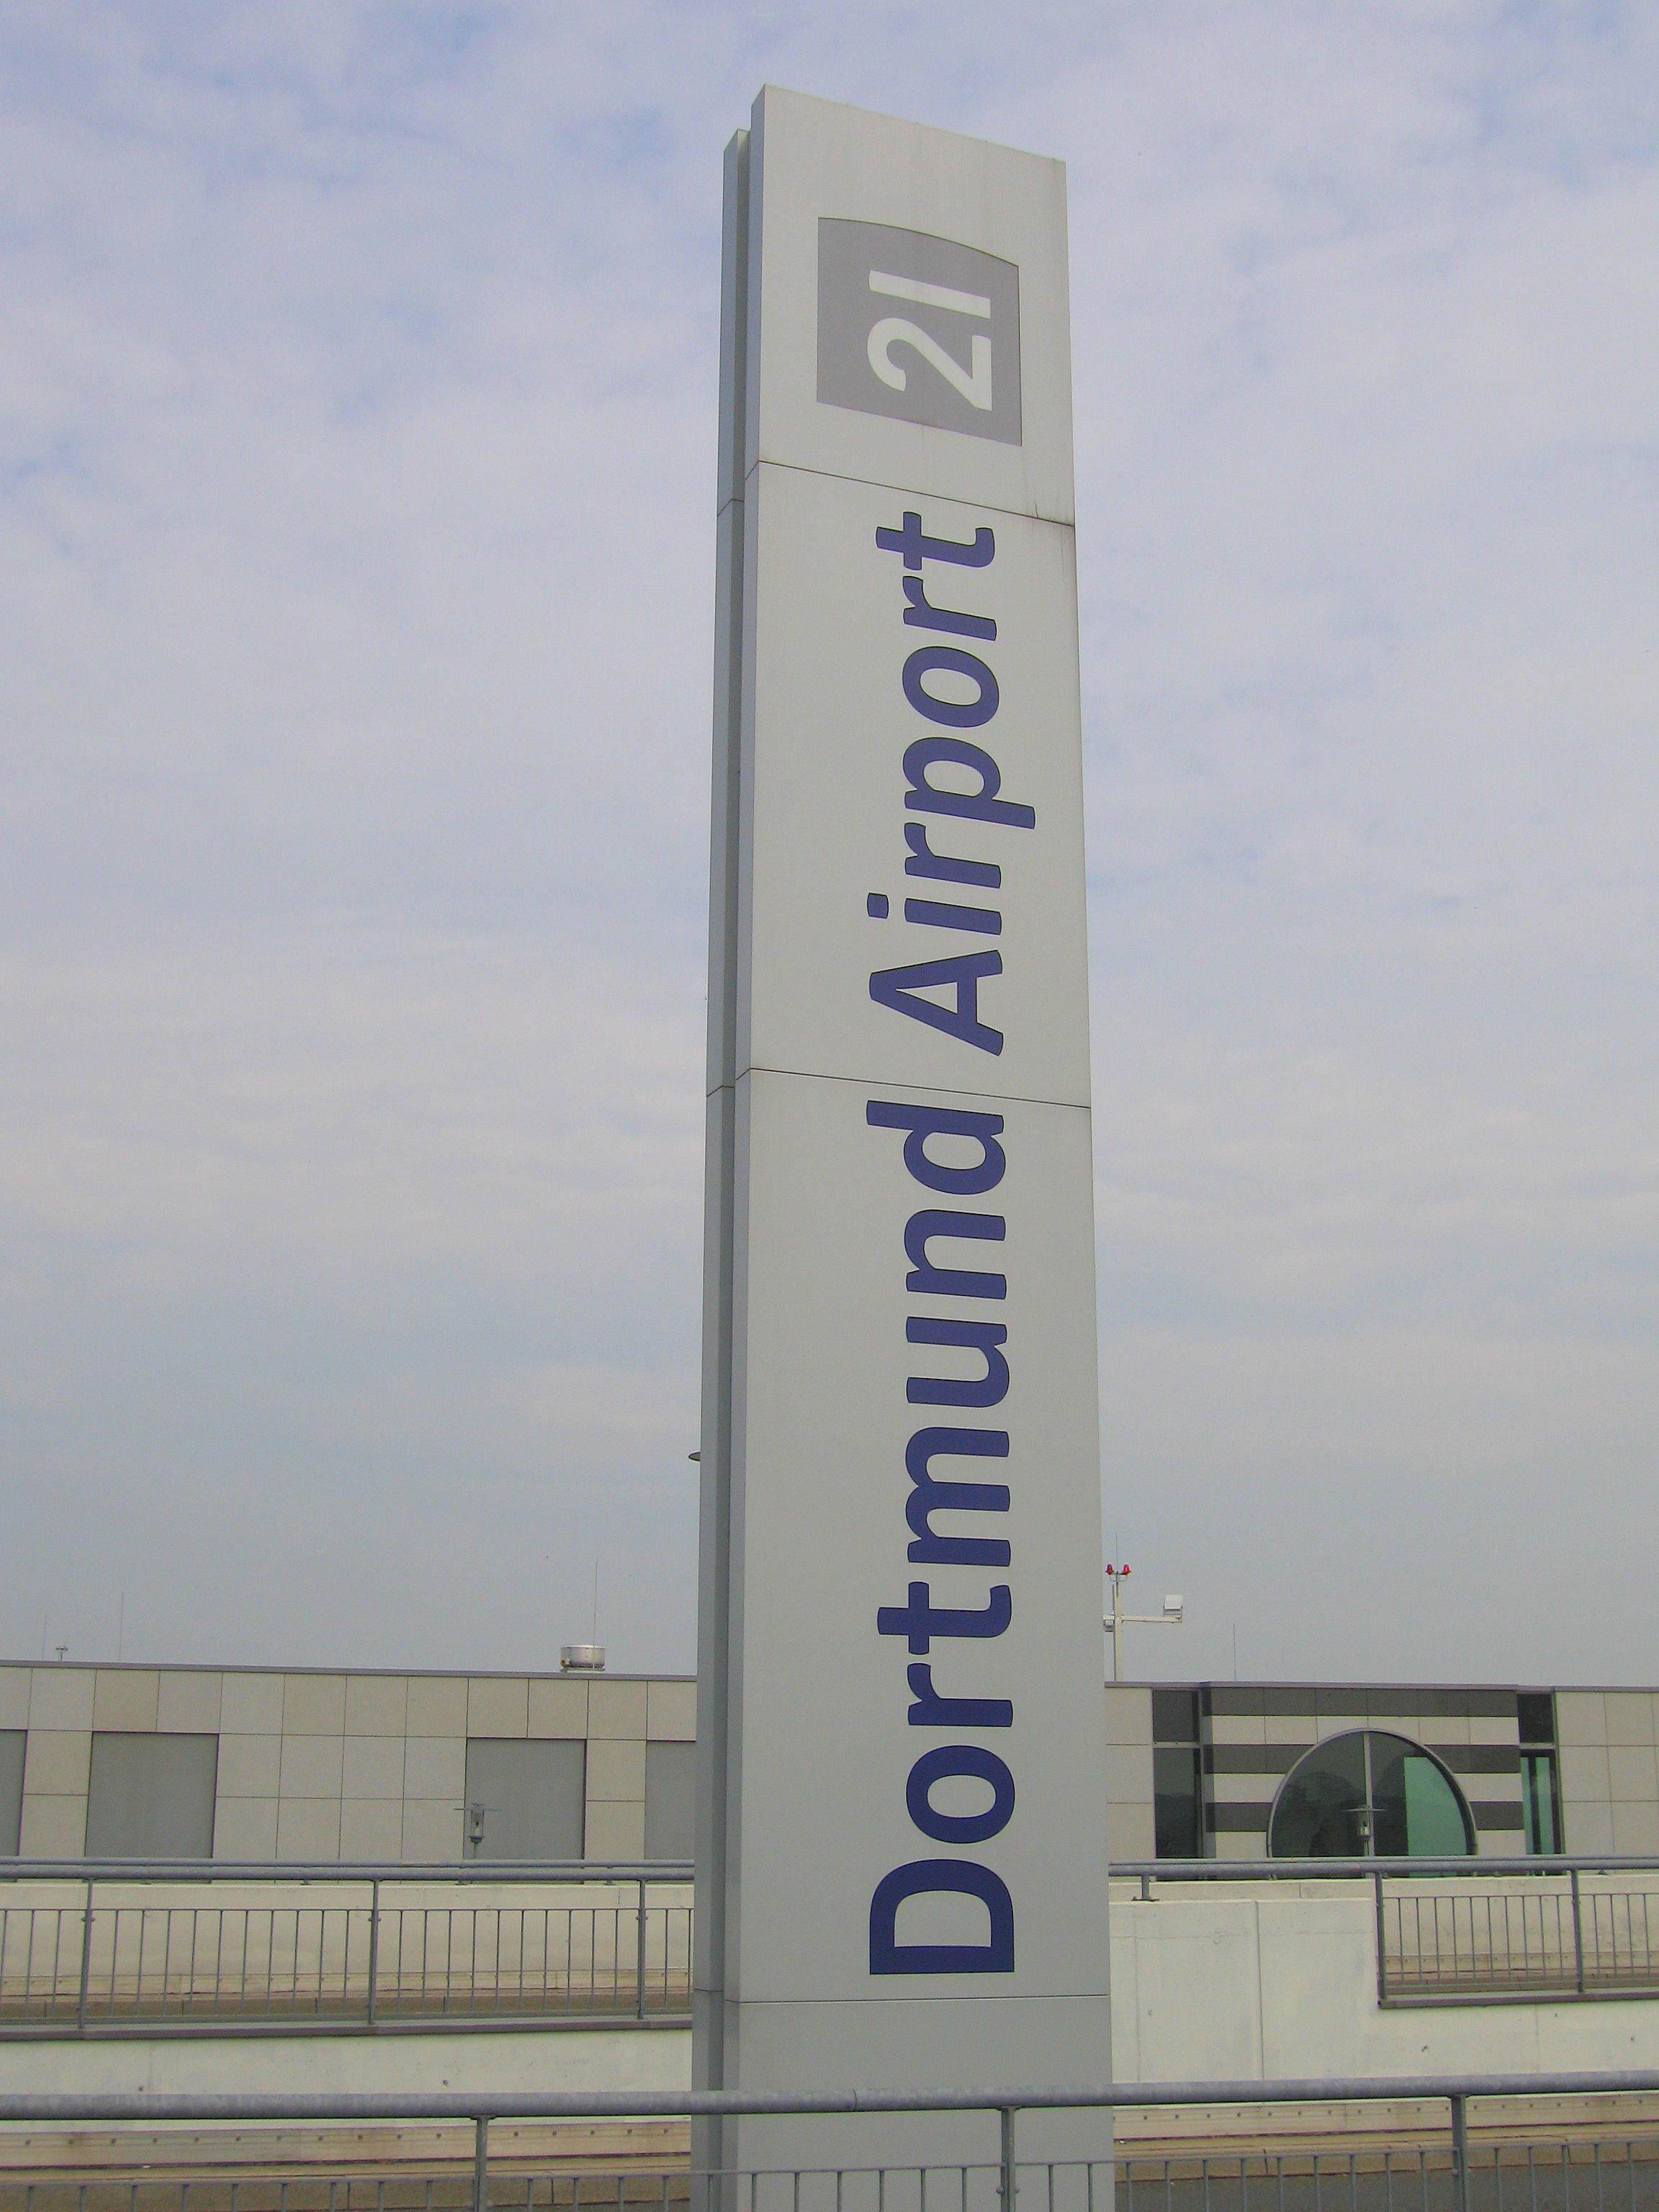 Dortmund Germania Cartina.Dortmund Wikivoyage Guida Turistica Di Viaggio